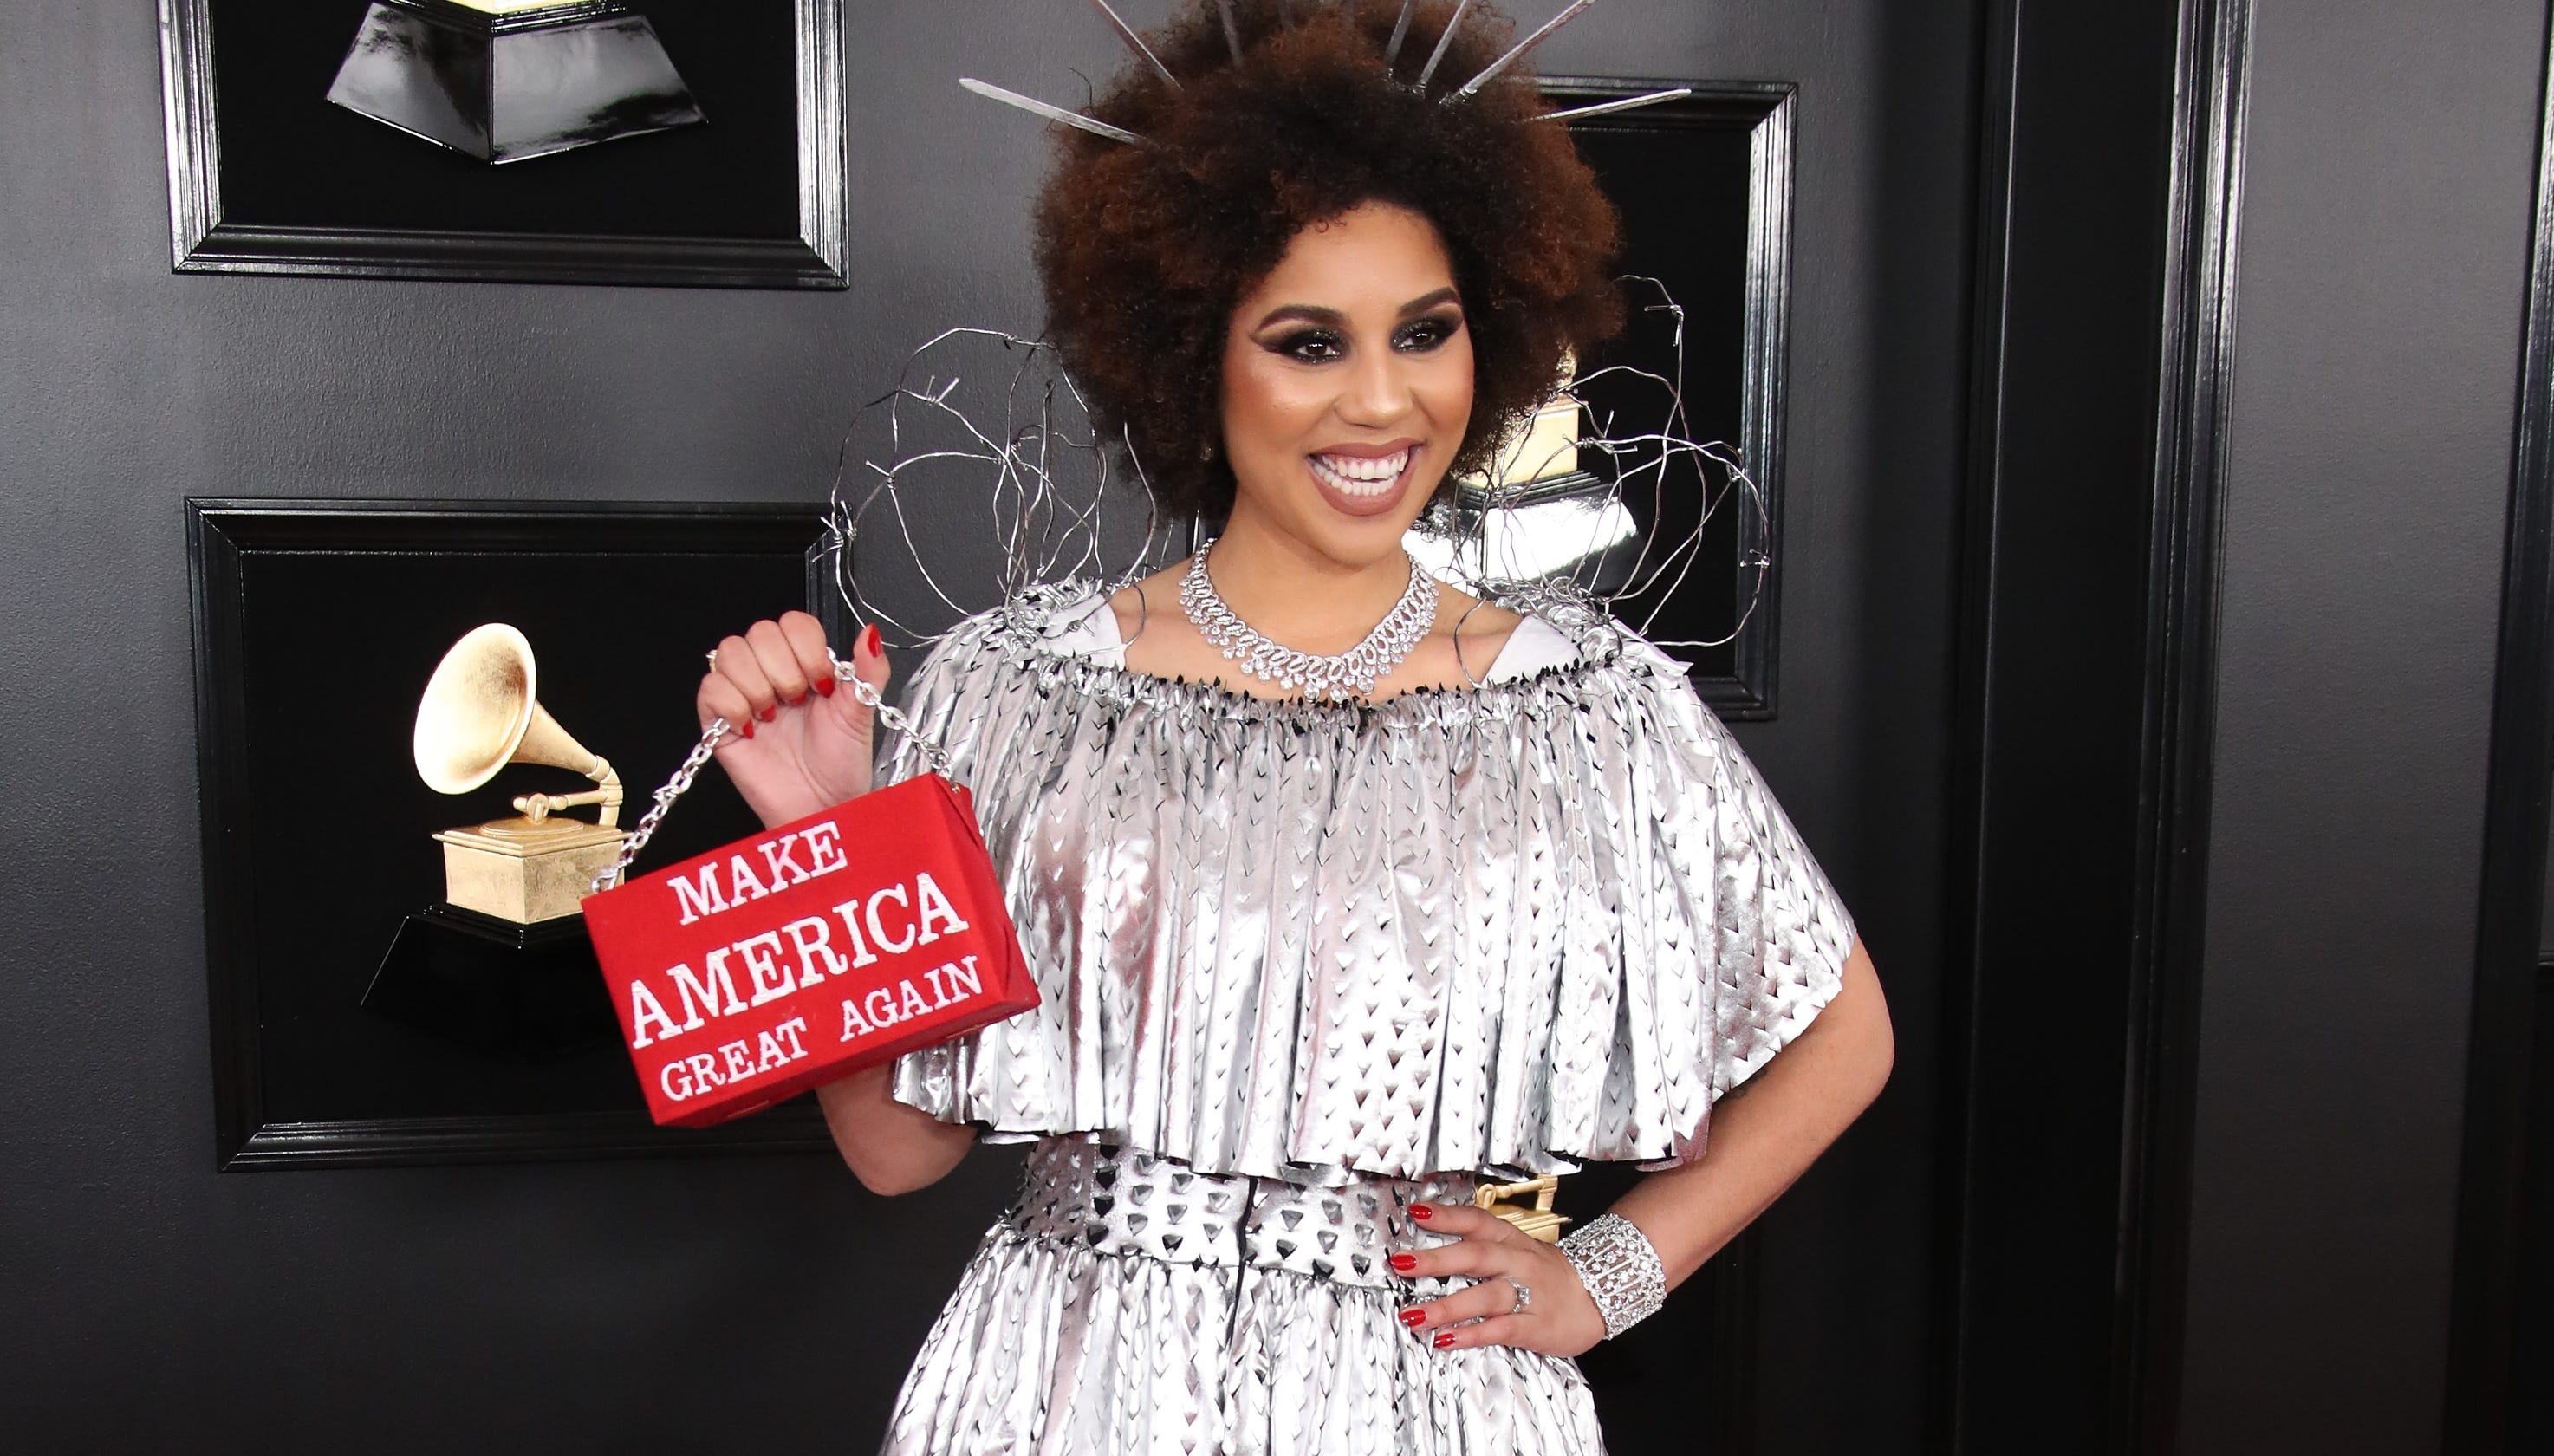 ff2cec6de007a Grammys 2019  Joy Villa met with backlash over  build the wall  dress